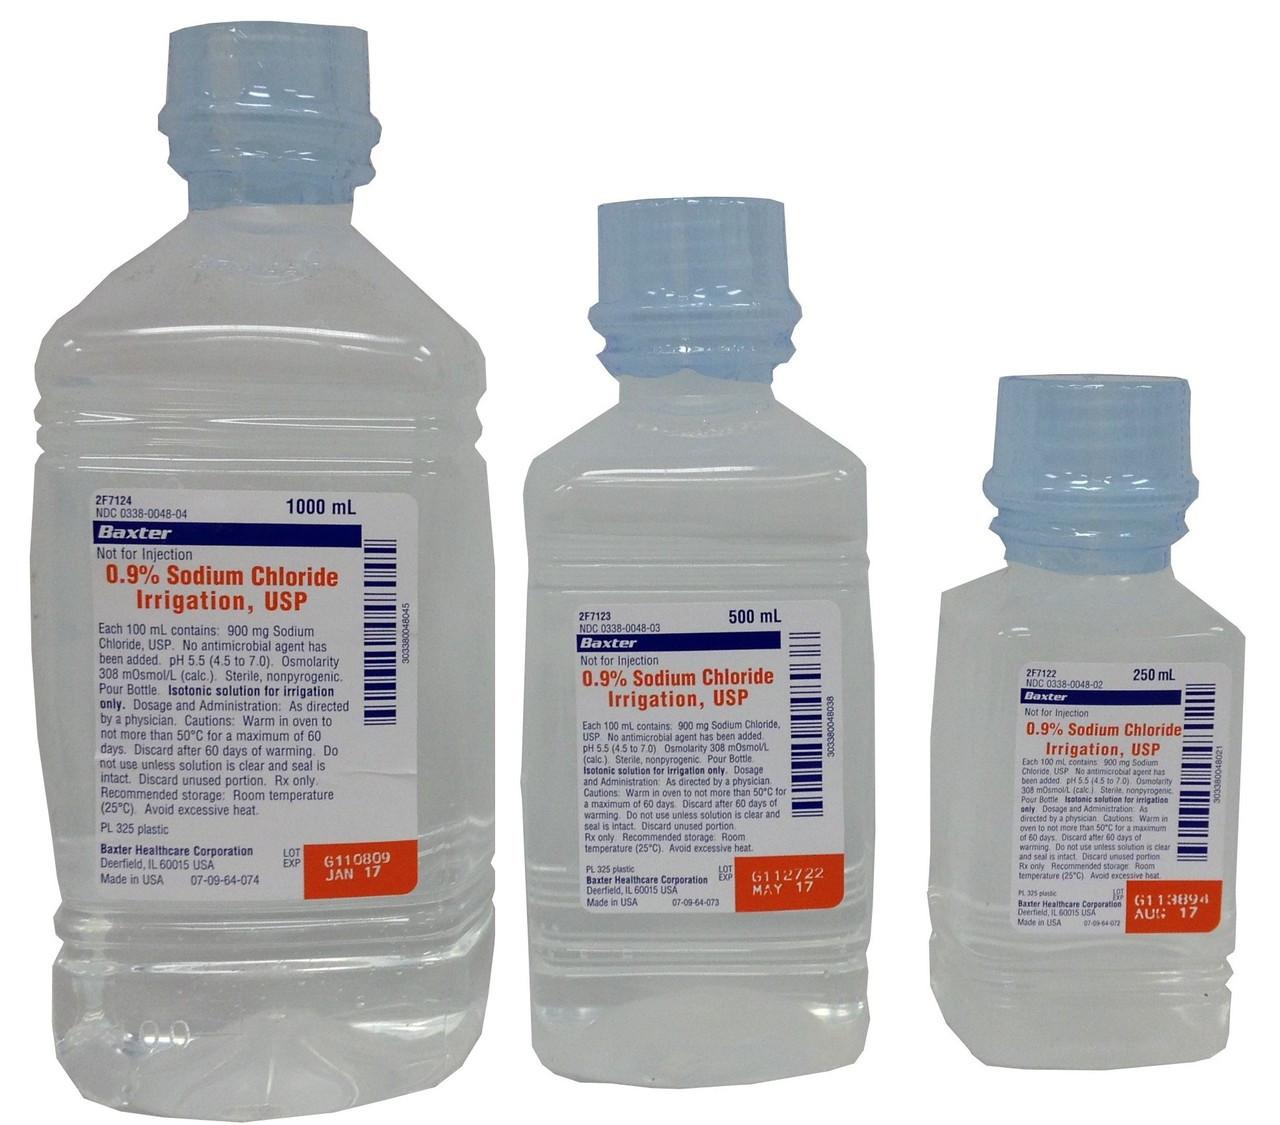 Saline (Sodium Chloride) For Irrigation In Bottles